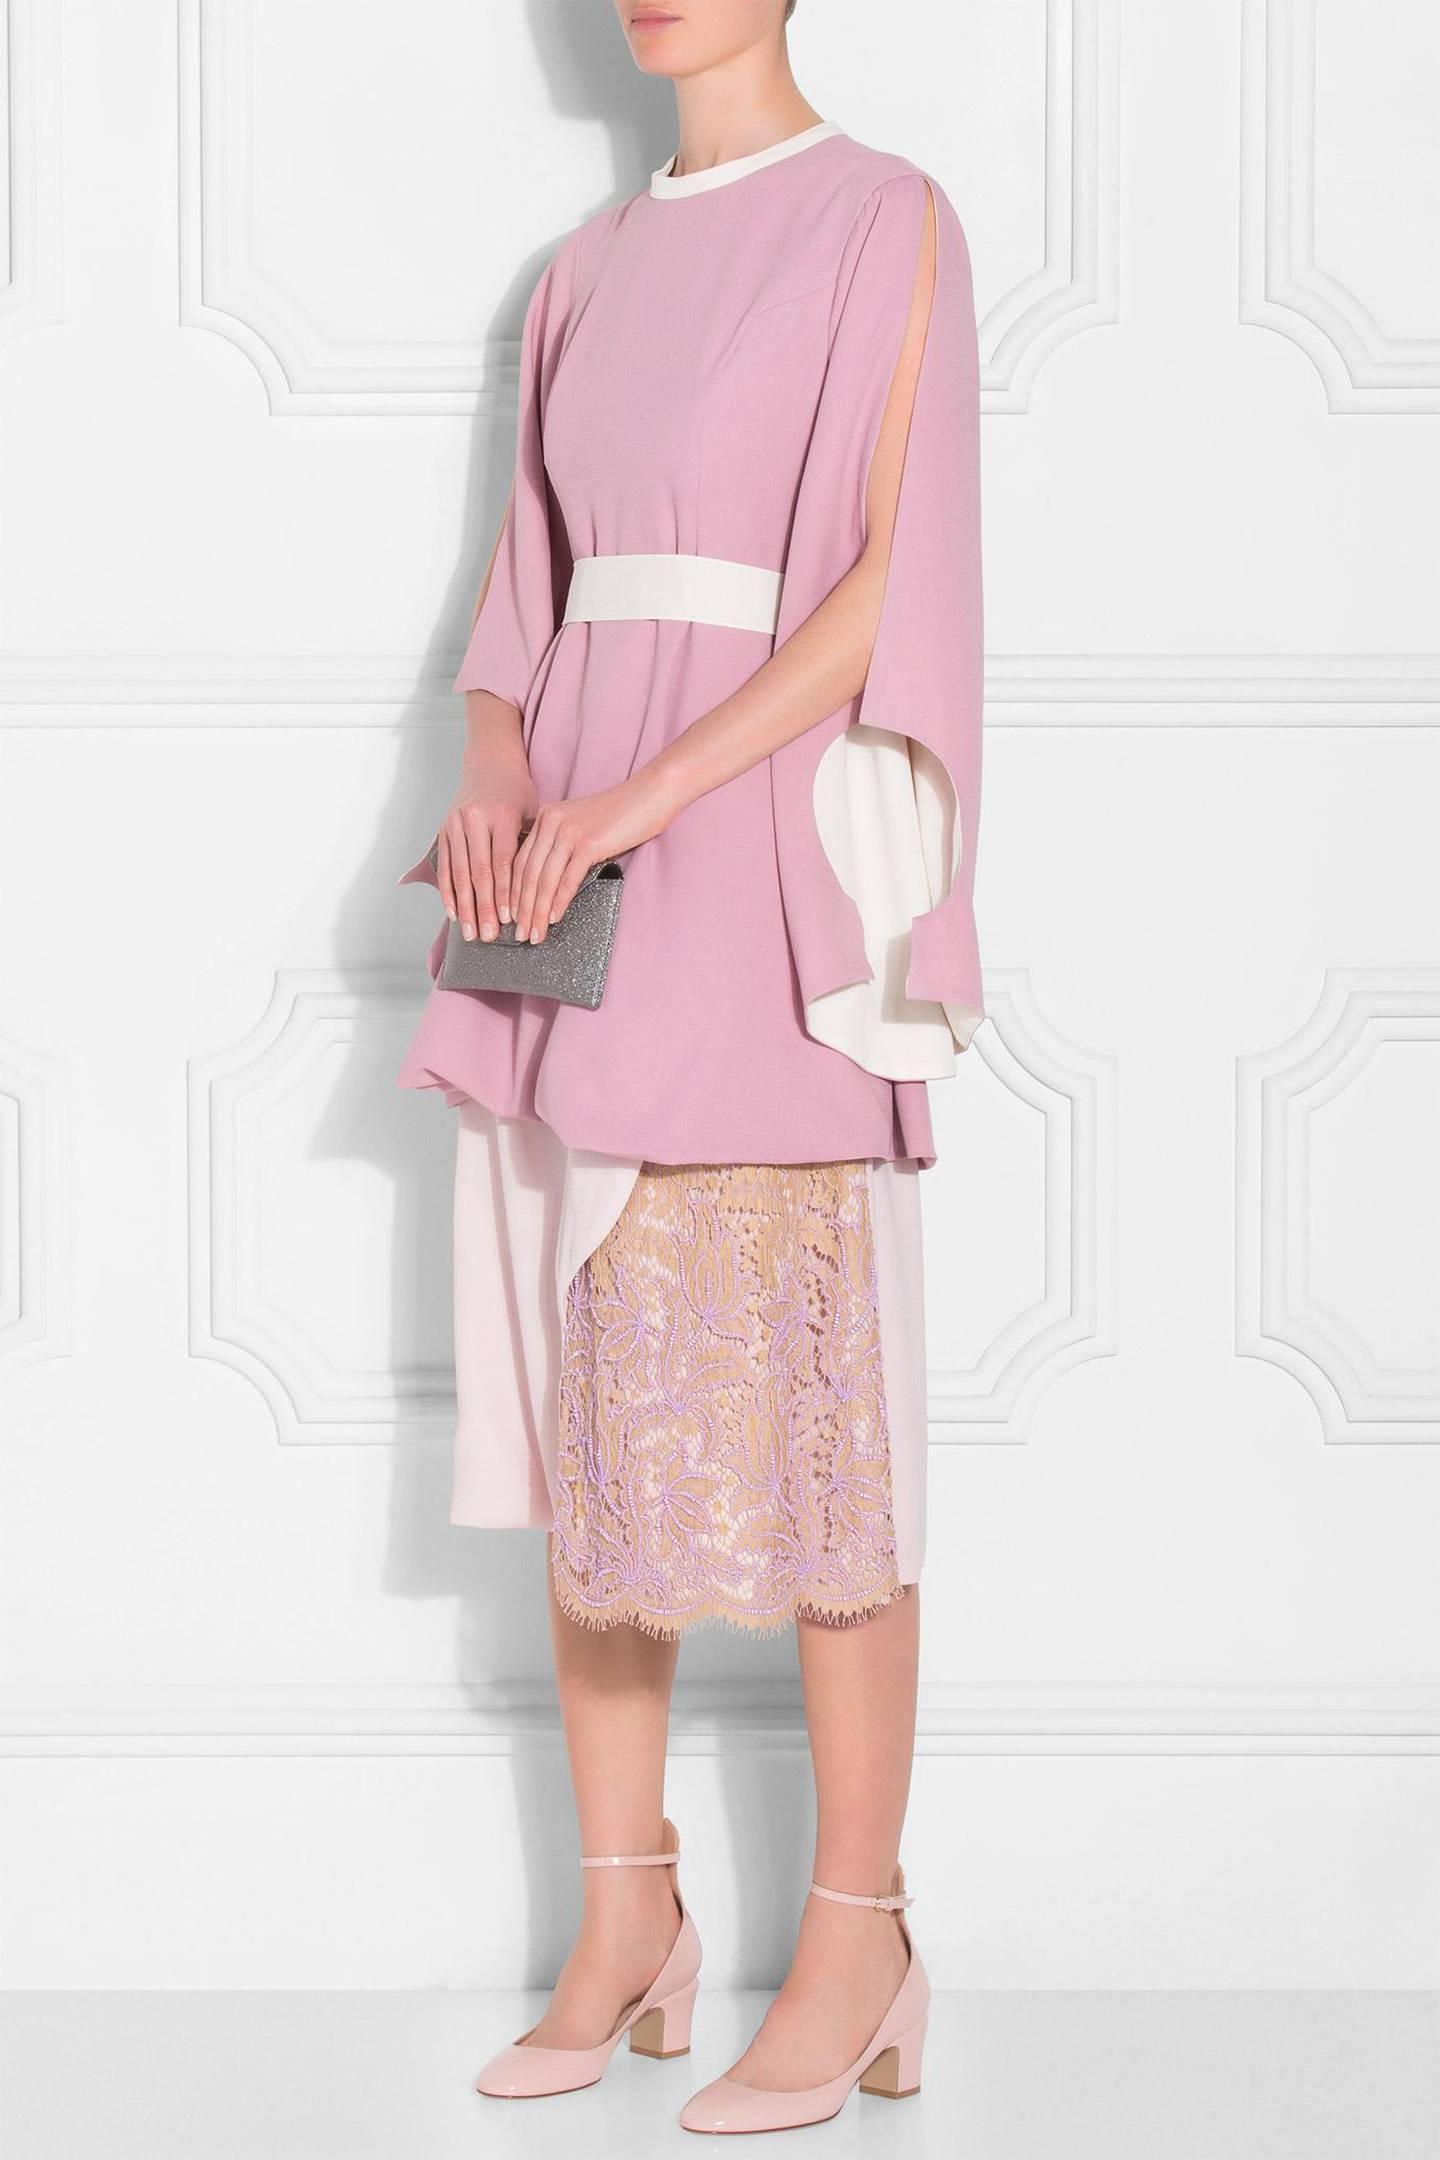 Madiyah Al Sharqi @ Symphony - Bell Top & Skirt.  Courtesy of Symphony  *** Local Caption ***  wk24fe-inbox6.jpeg